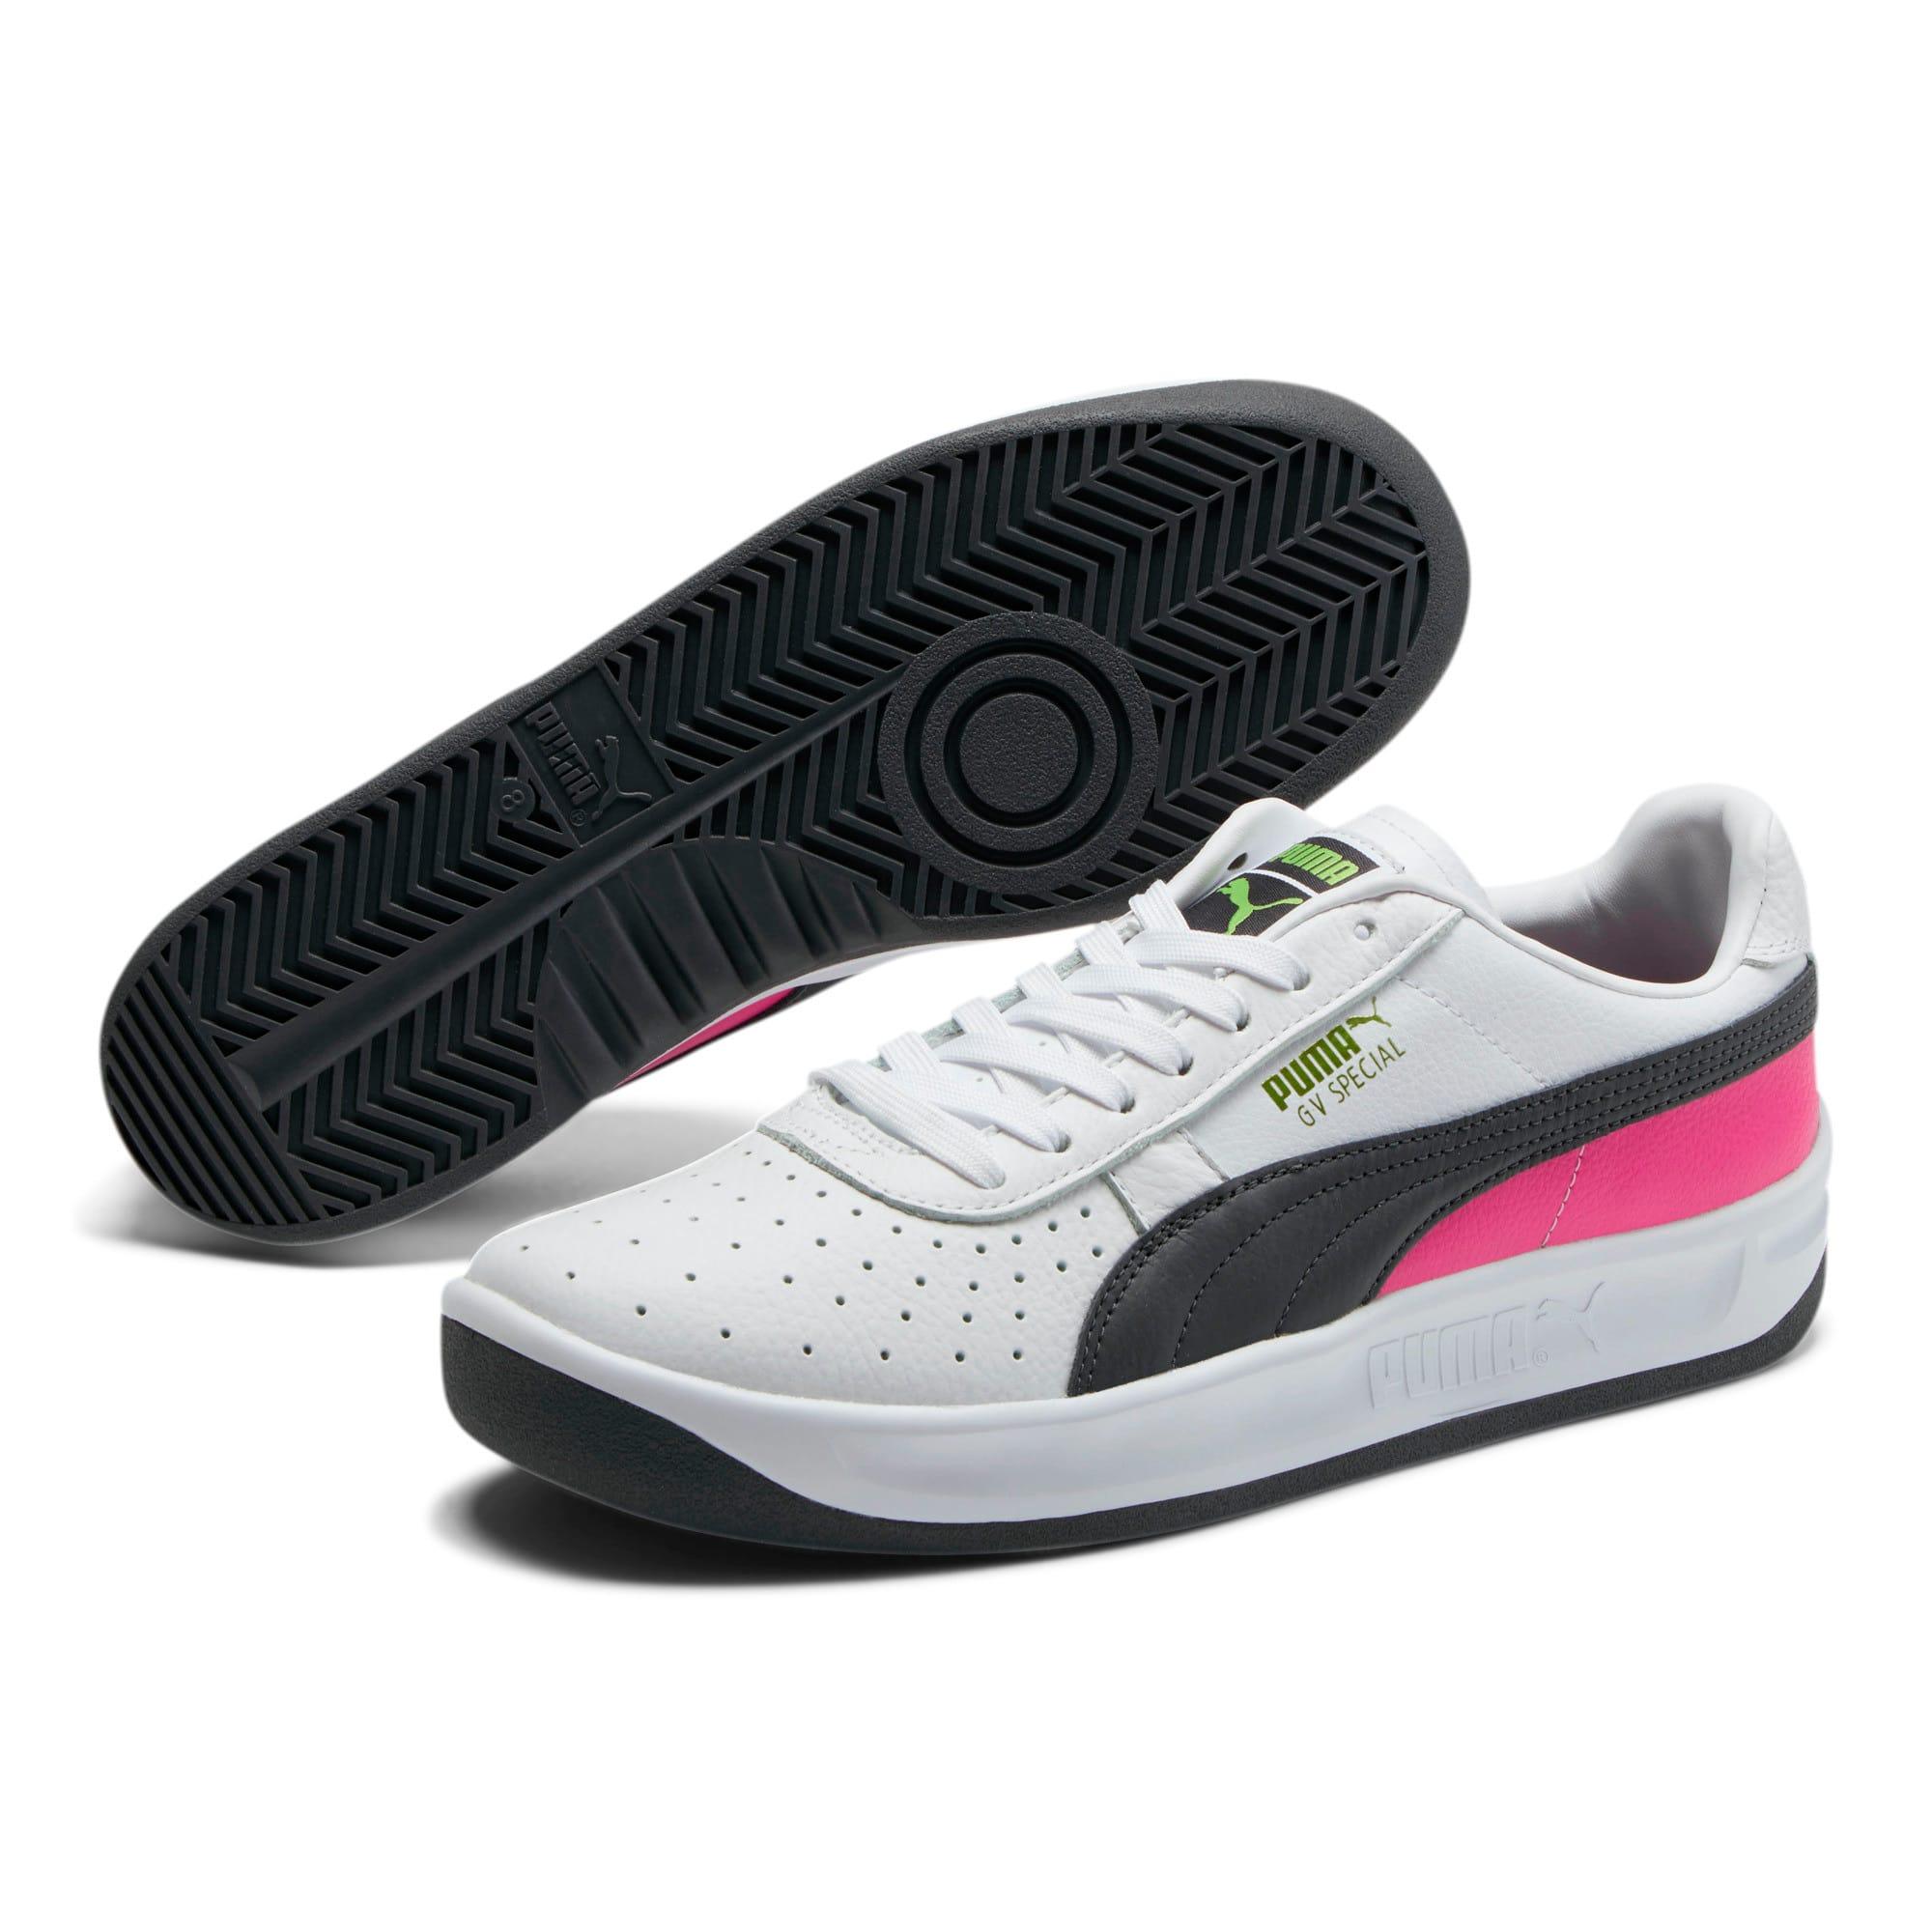 Thumbnail 2 of GV Special + ColorBlock Men's Sneakers, P White-P Blk-Fuchsia Purple, medium